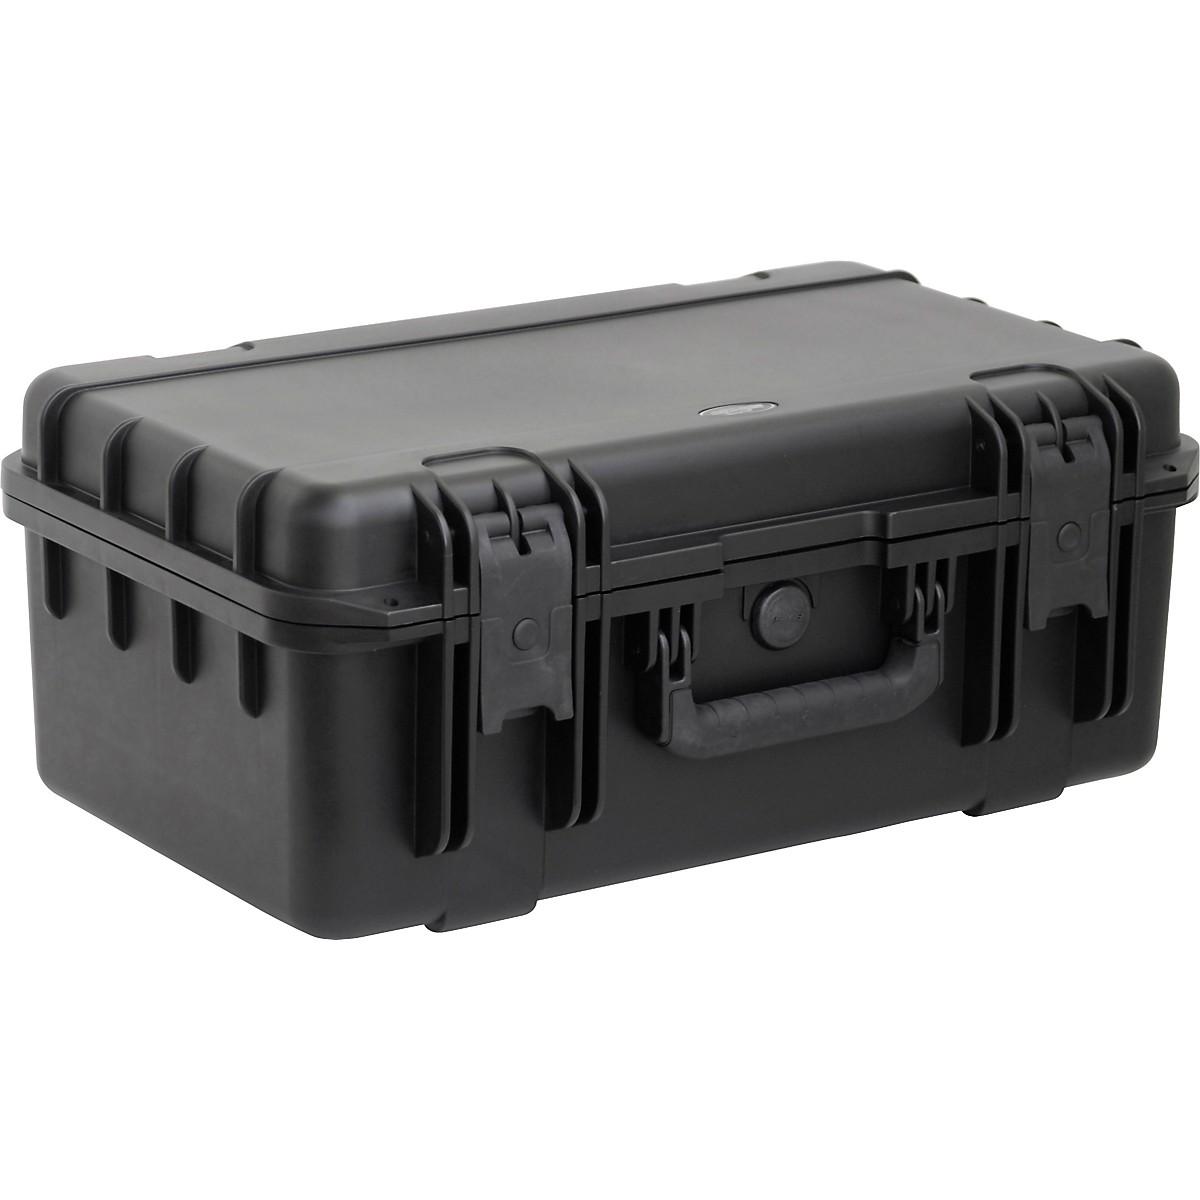 SKB 3i-2011-8B Military Standard Waterproof Case